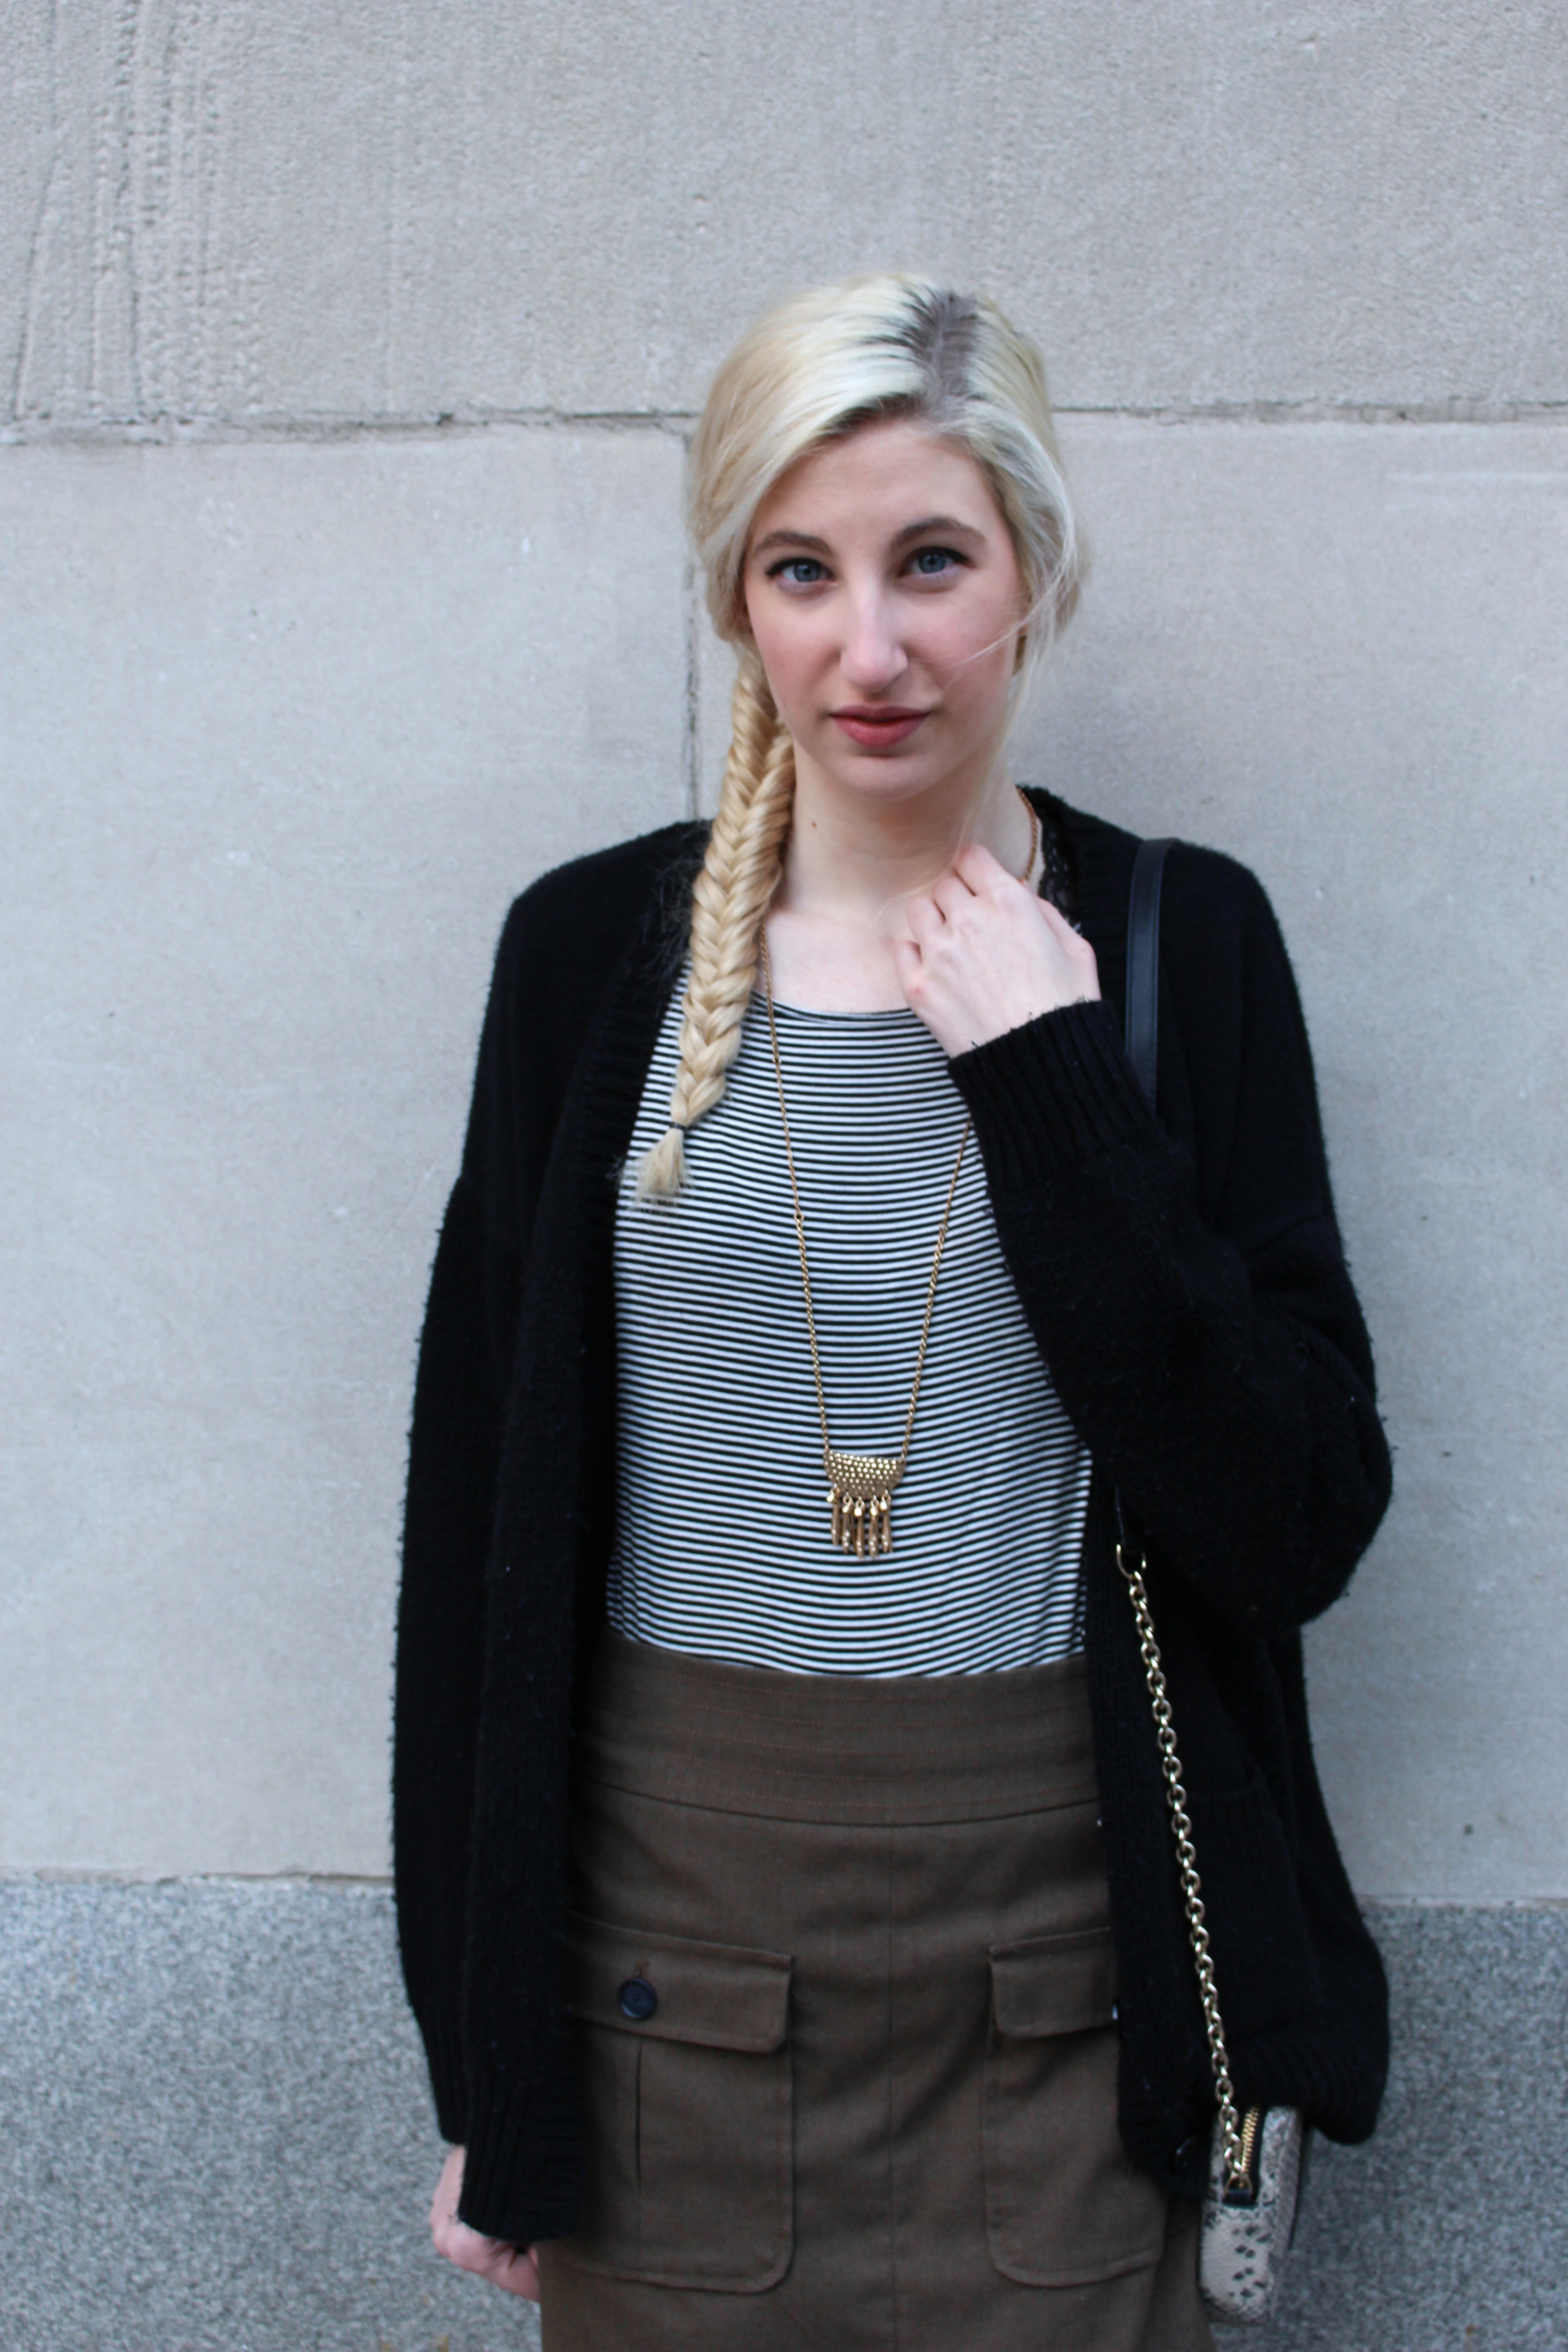 LOFT striped long sleeve knit top, LOFT army green skirt, LOFT gold fringe necklace, Forever21 oversized cardigan, H&M tights, LOFT polka dot d'orsay flats